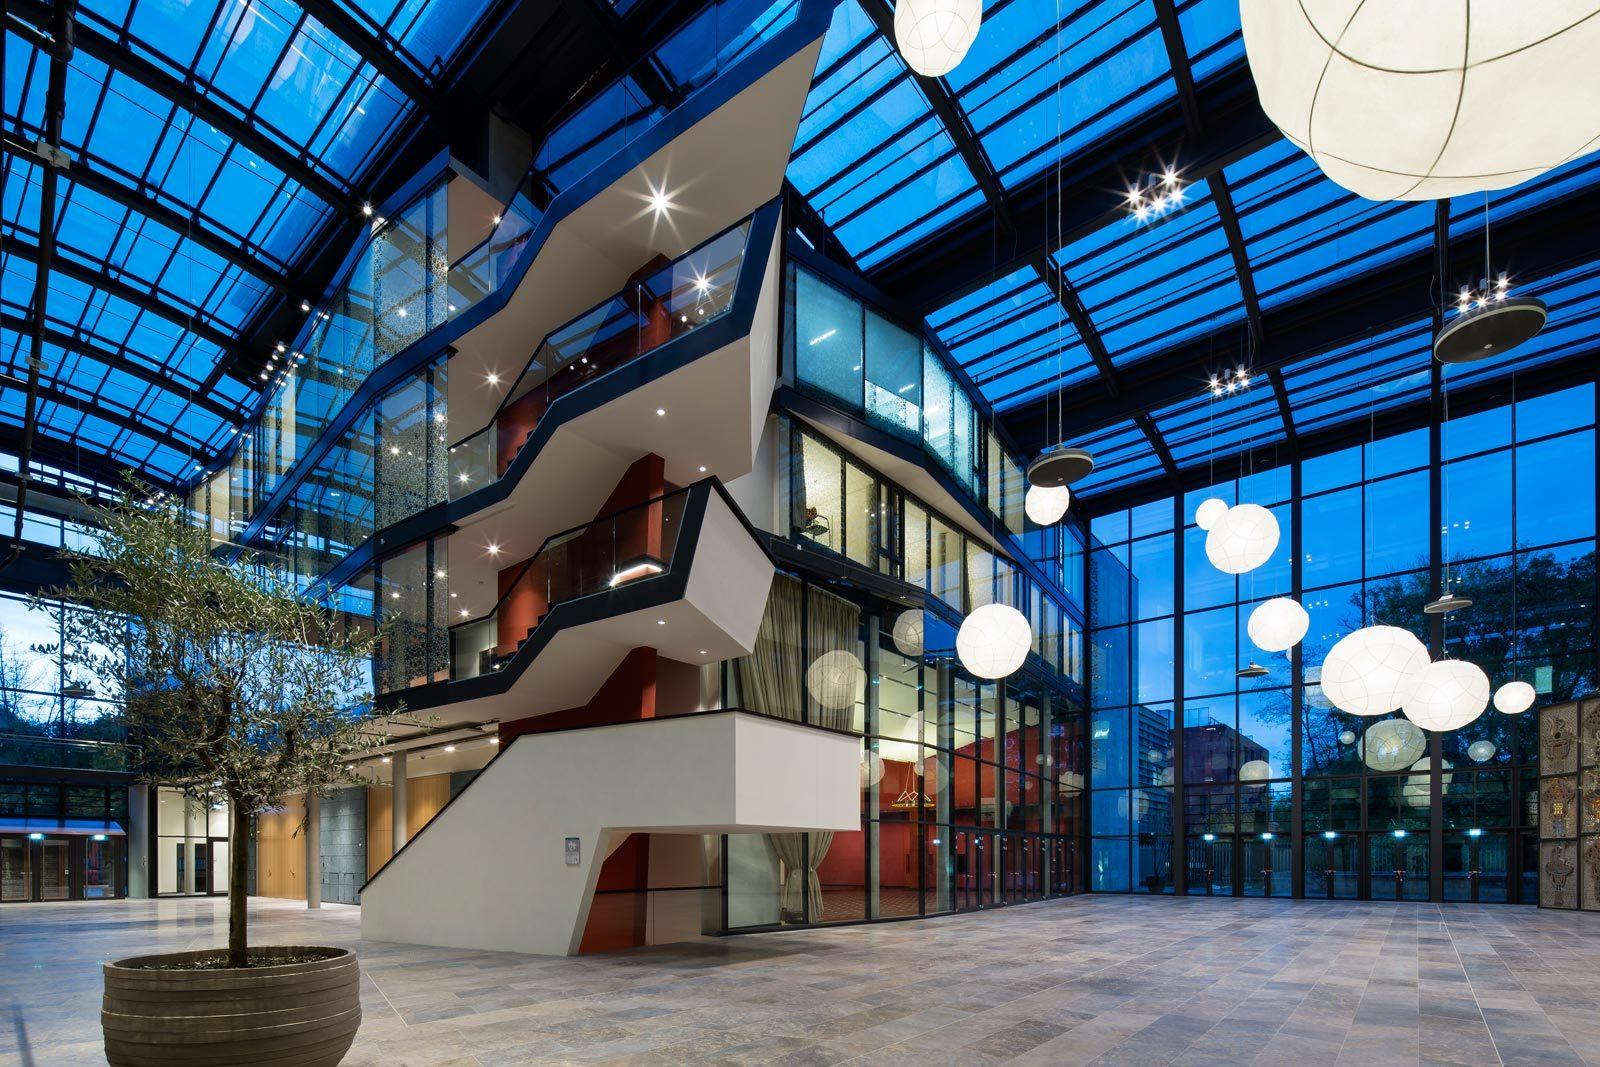 52689da3e8e44e88a00003bf_turkish-embassy-in-berlin-nsh-architekten_felipe_schmidt_05